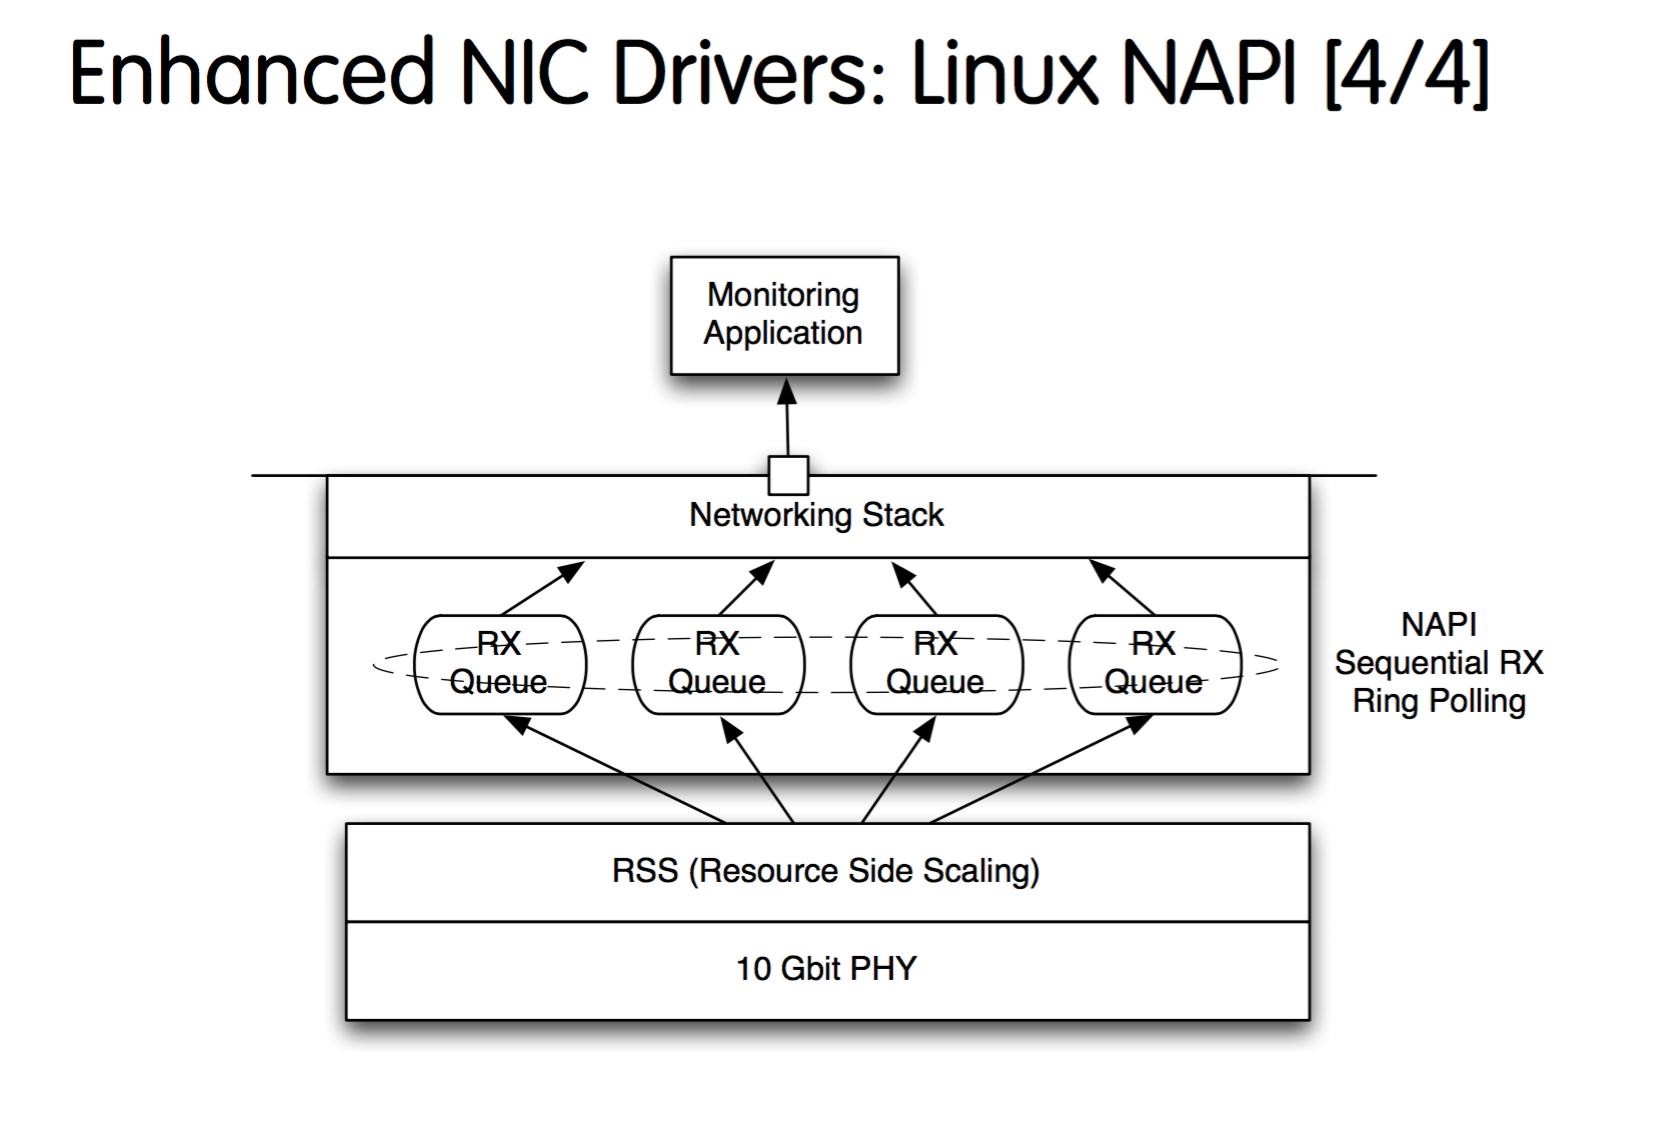 Enhanced NIC Drivers_Linux NAPI